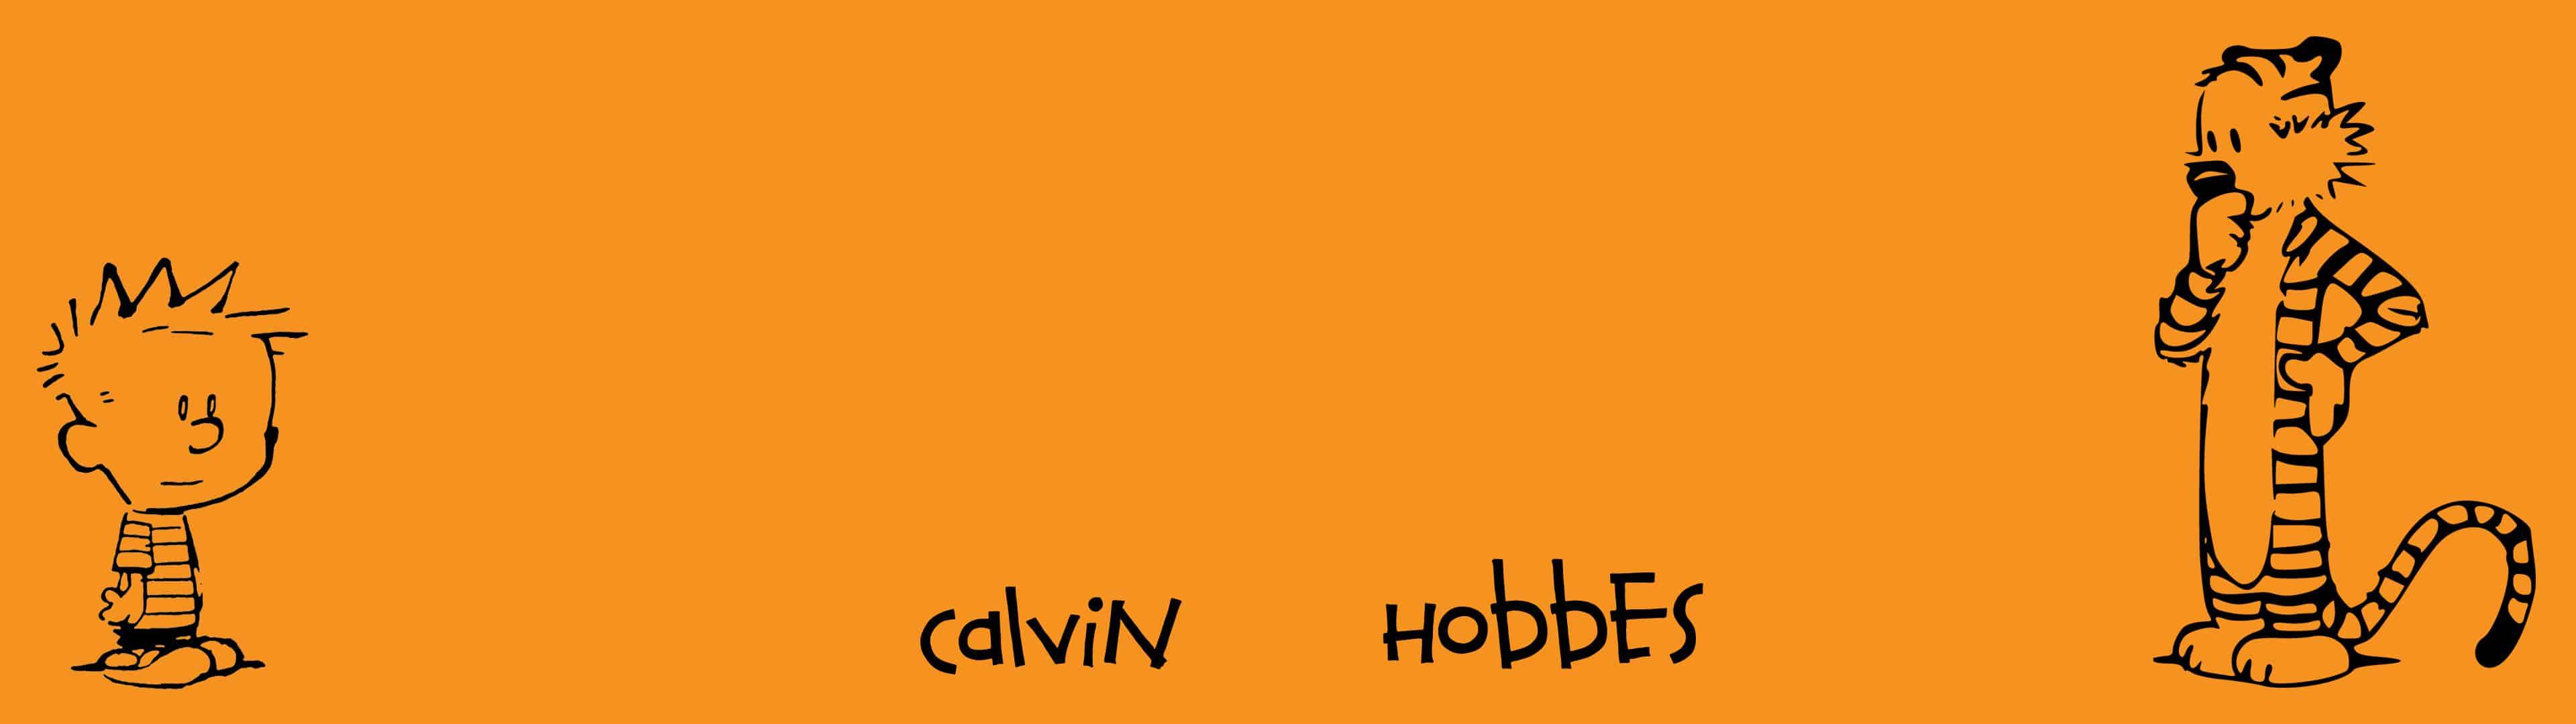 calvin and hobbes dual monitor wallpaper